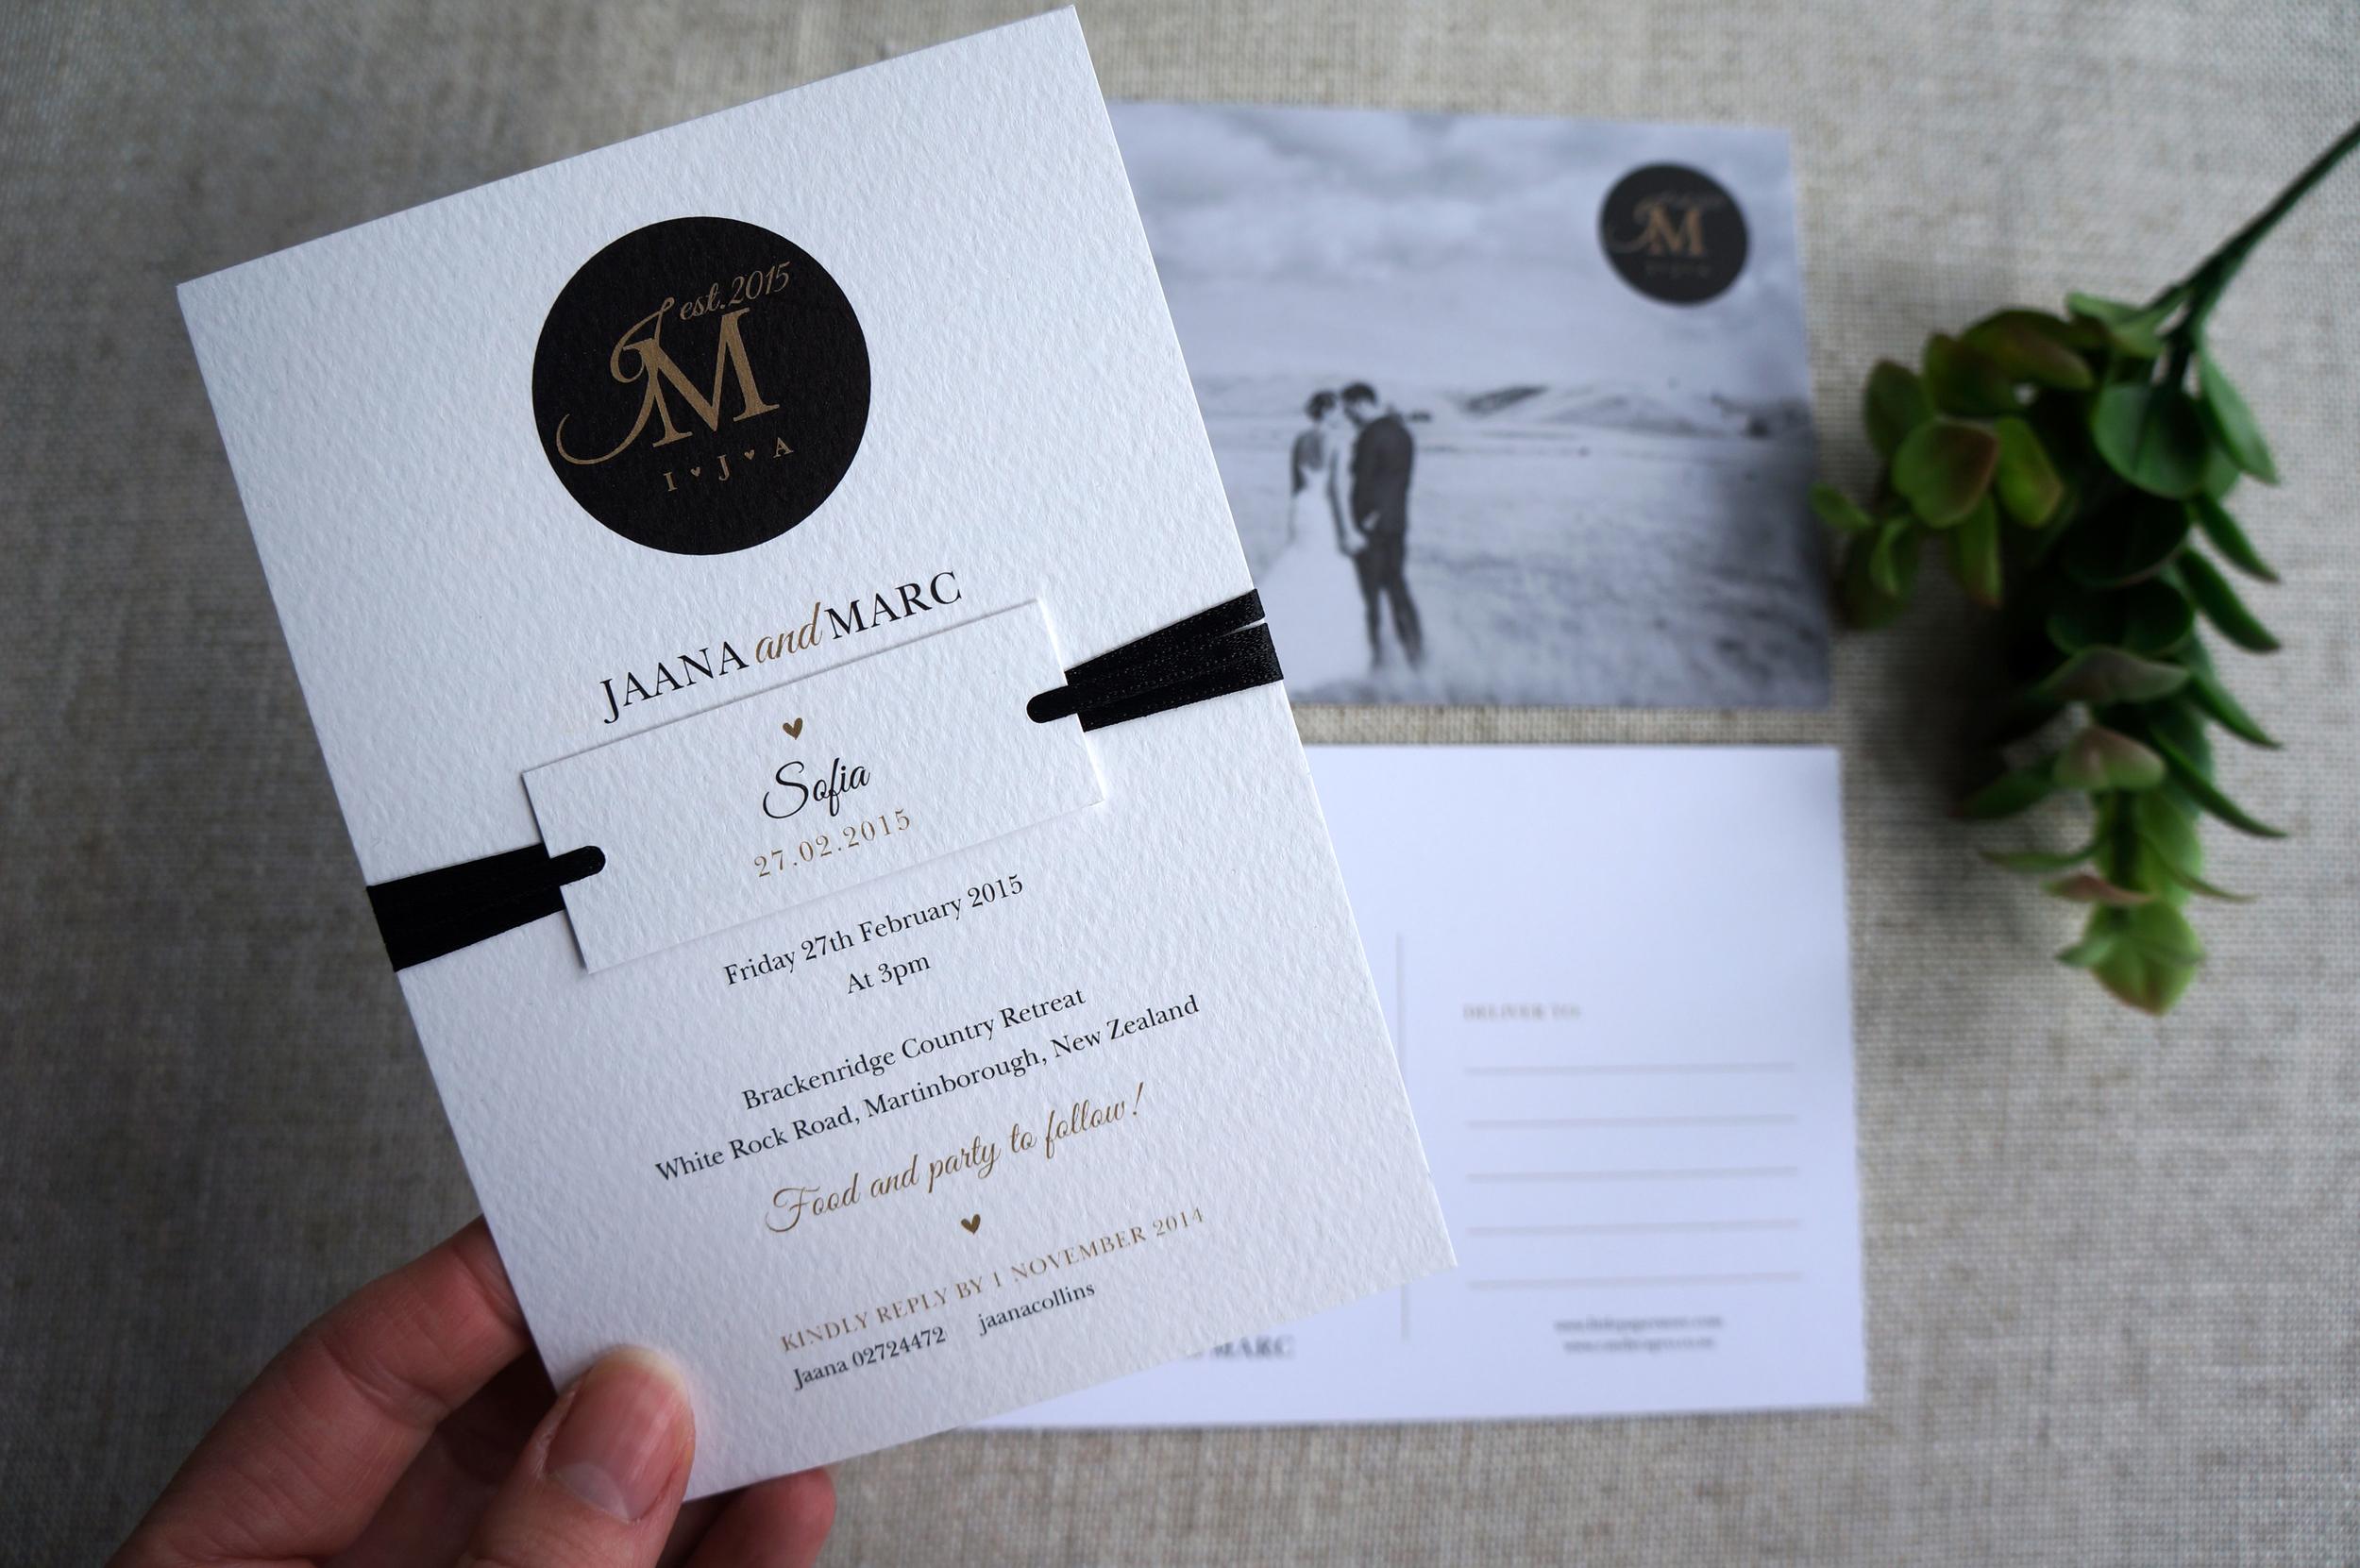 Custom wedding invitation wedding invitations little paper store dsc04835g monicamarmolfo Image collections